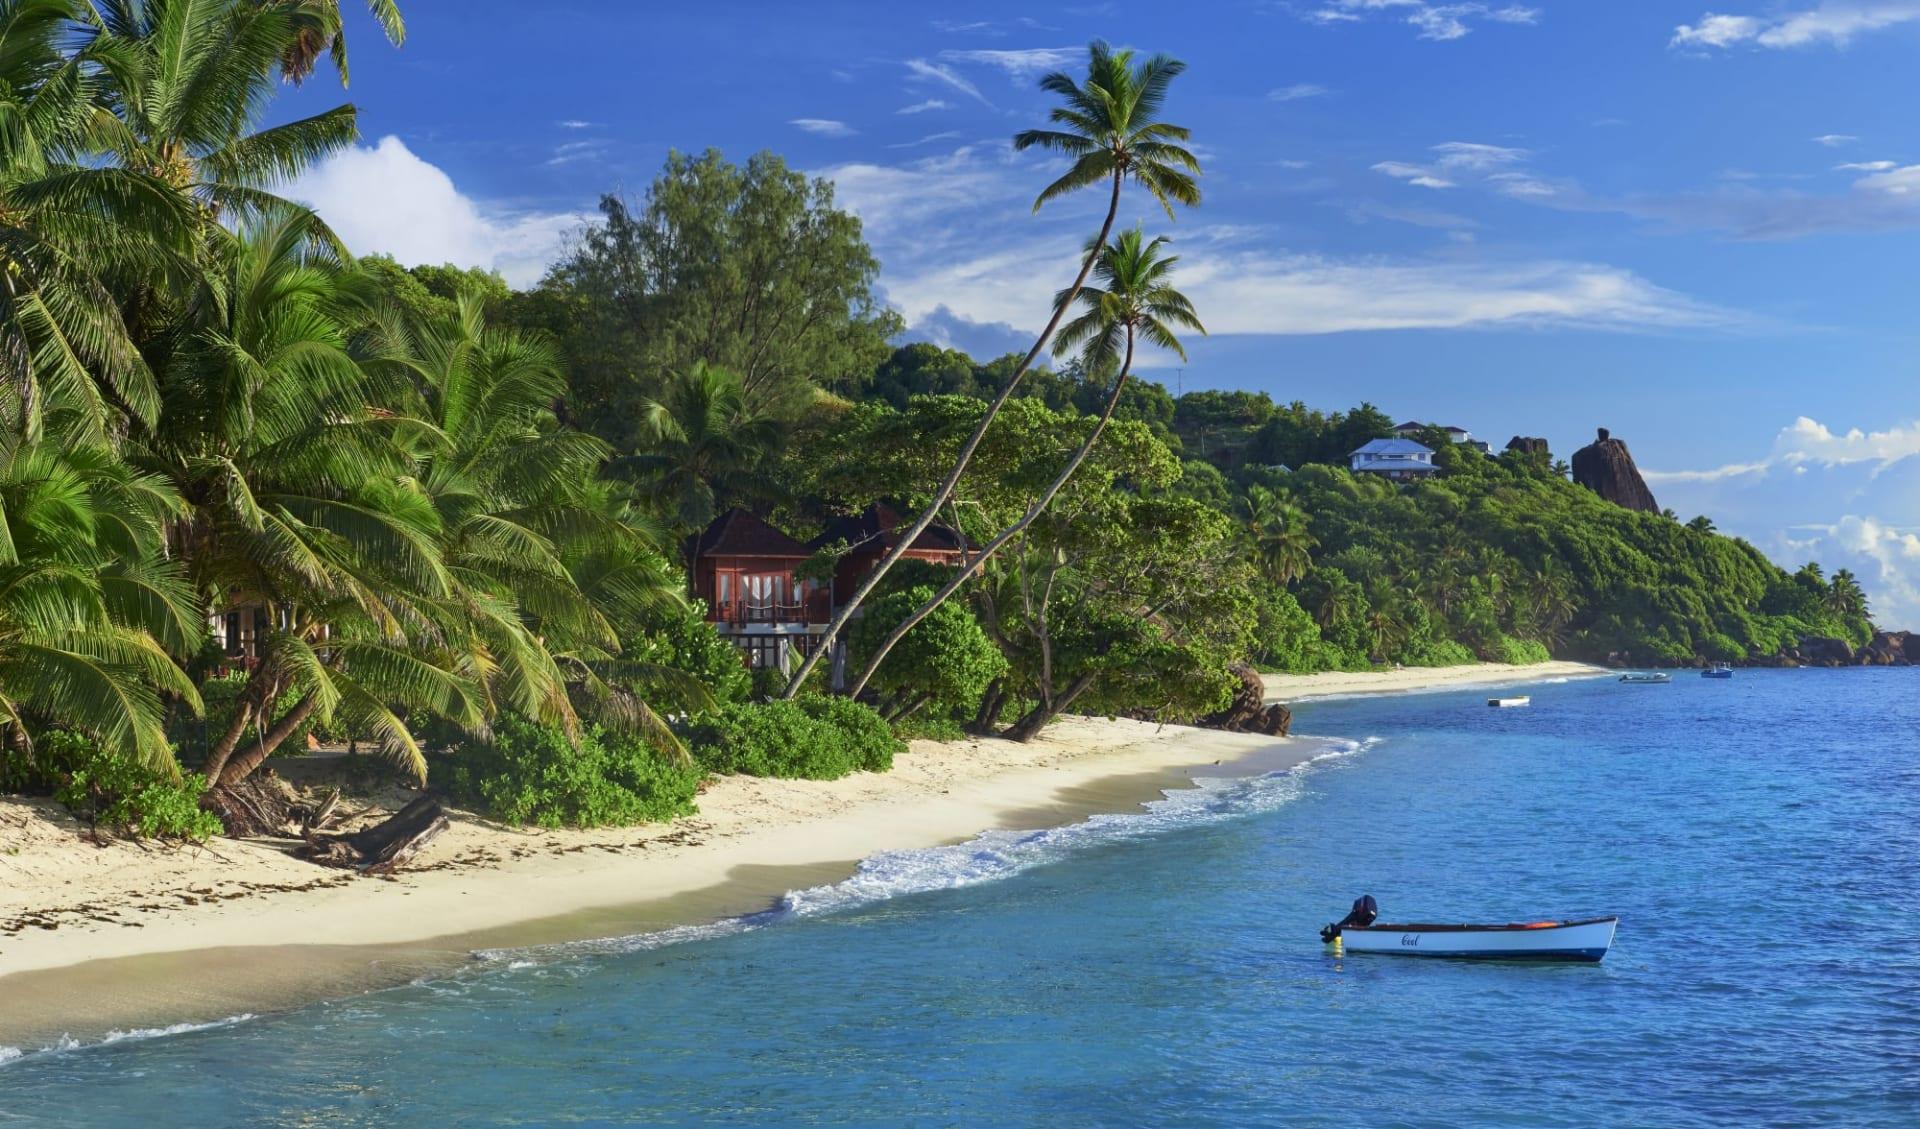 DoubleTree by Hilton Seychelles Allamanda Resort & Spa in Mahé: